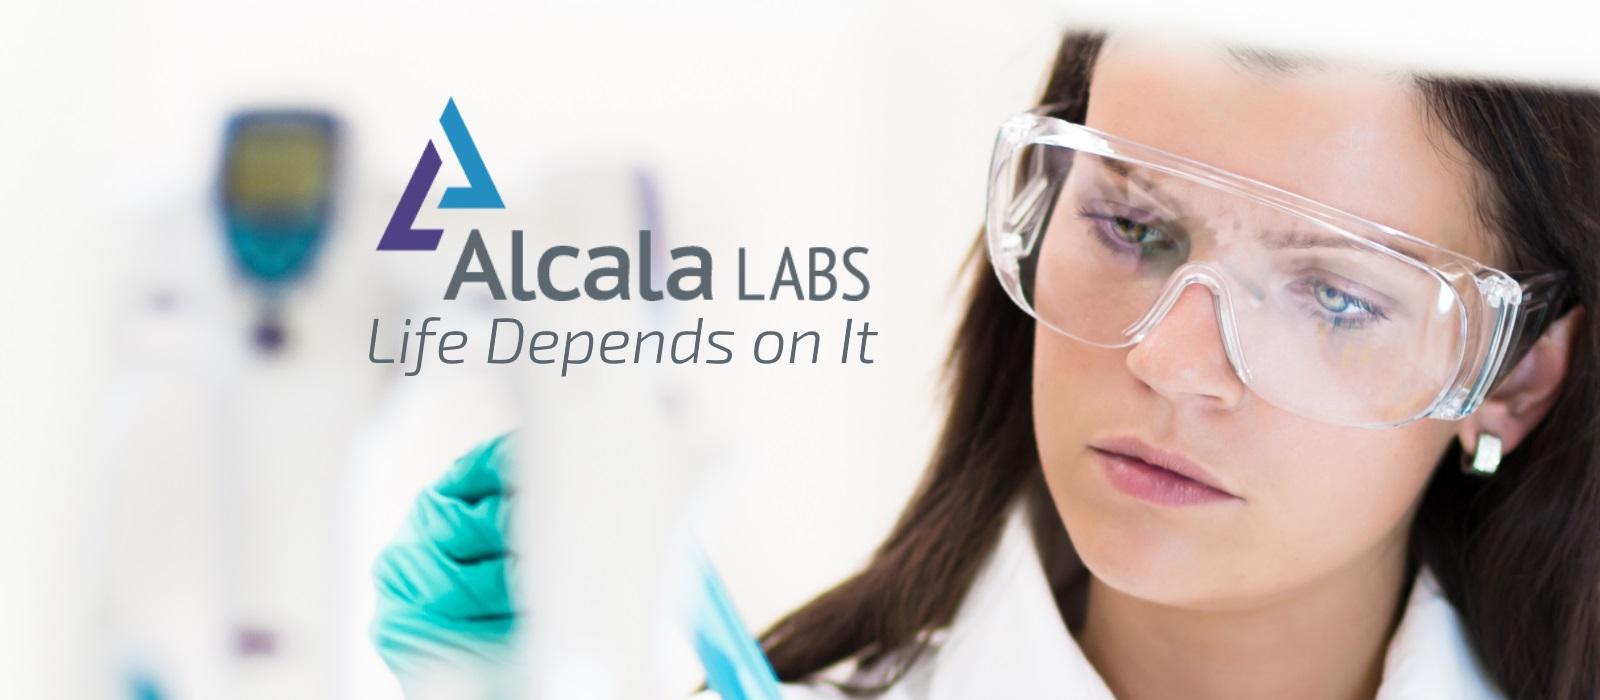 Alcala Laboratories